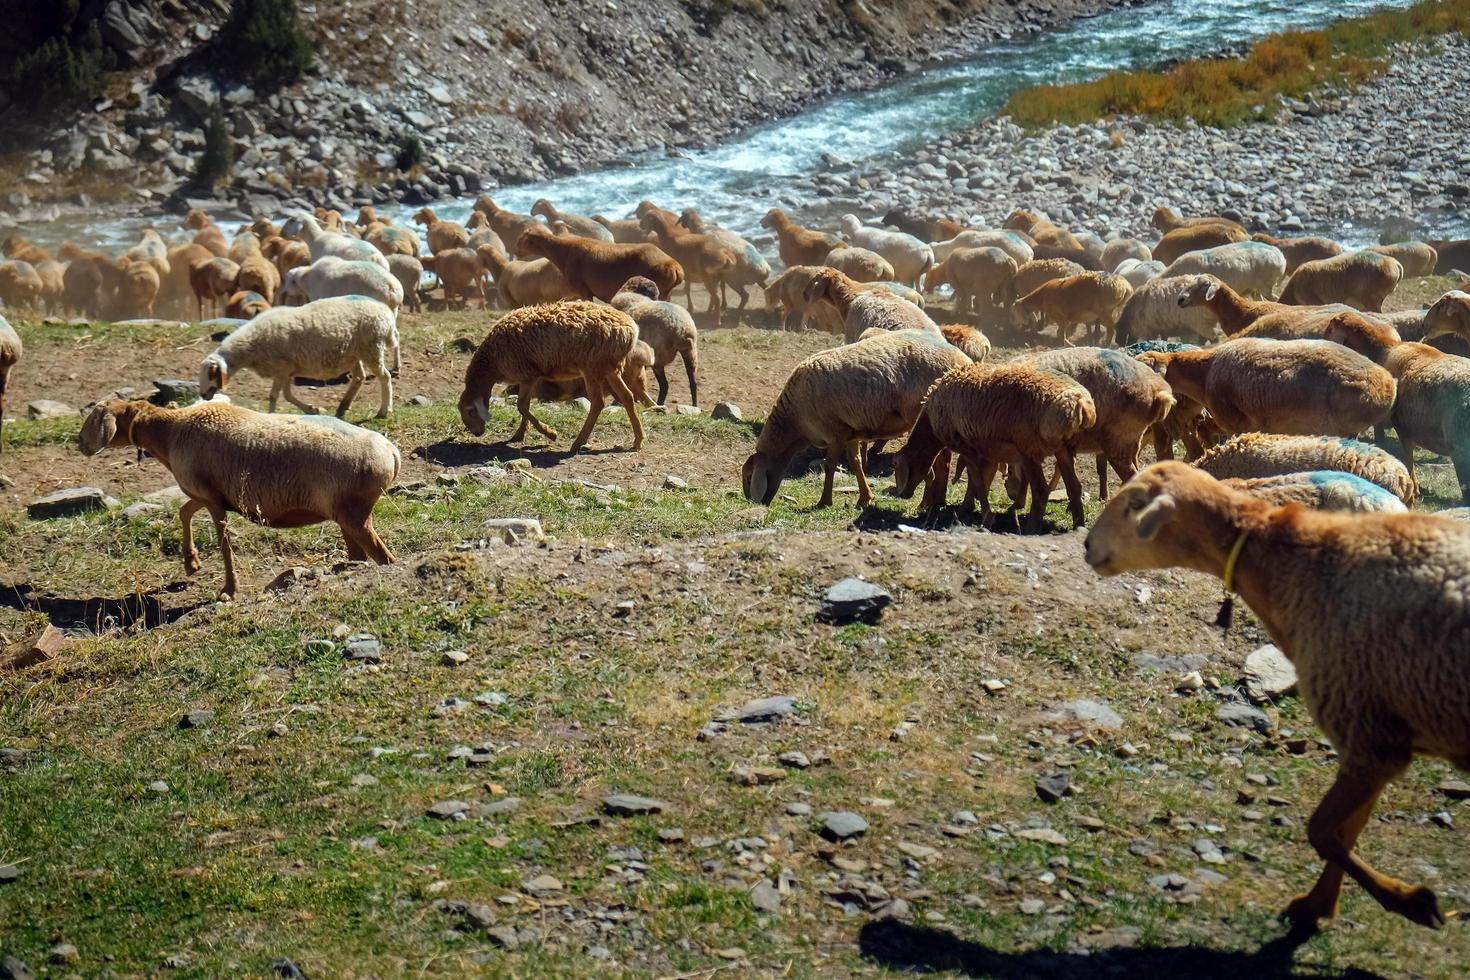 Herd of local sheep grazing near river photo